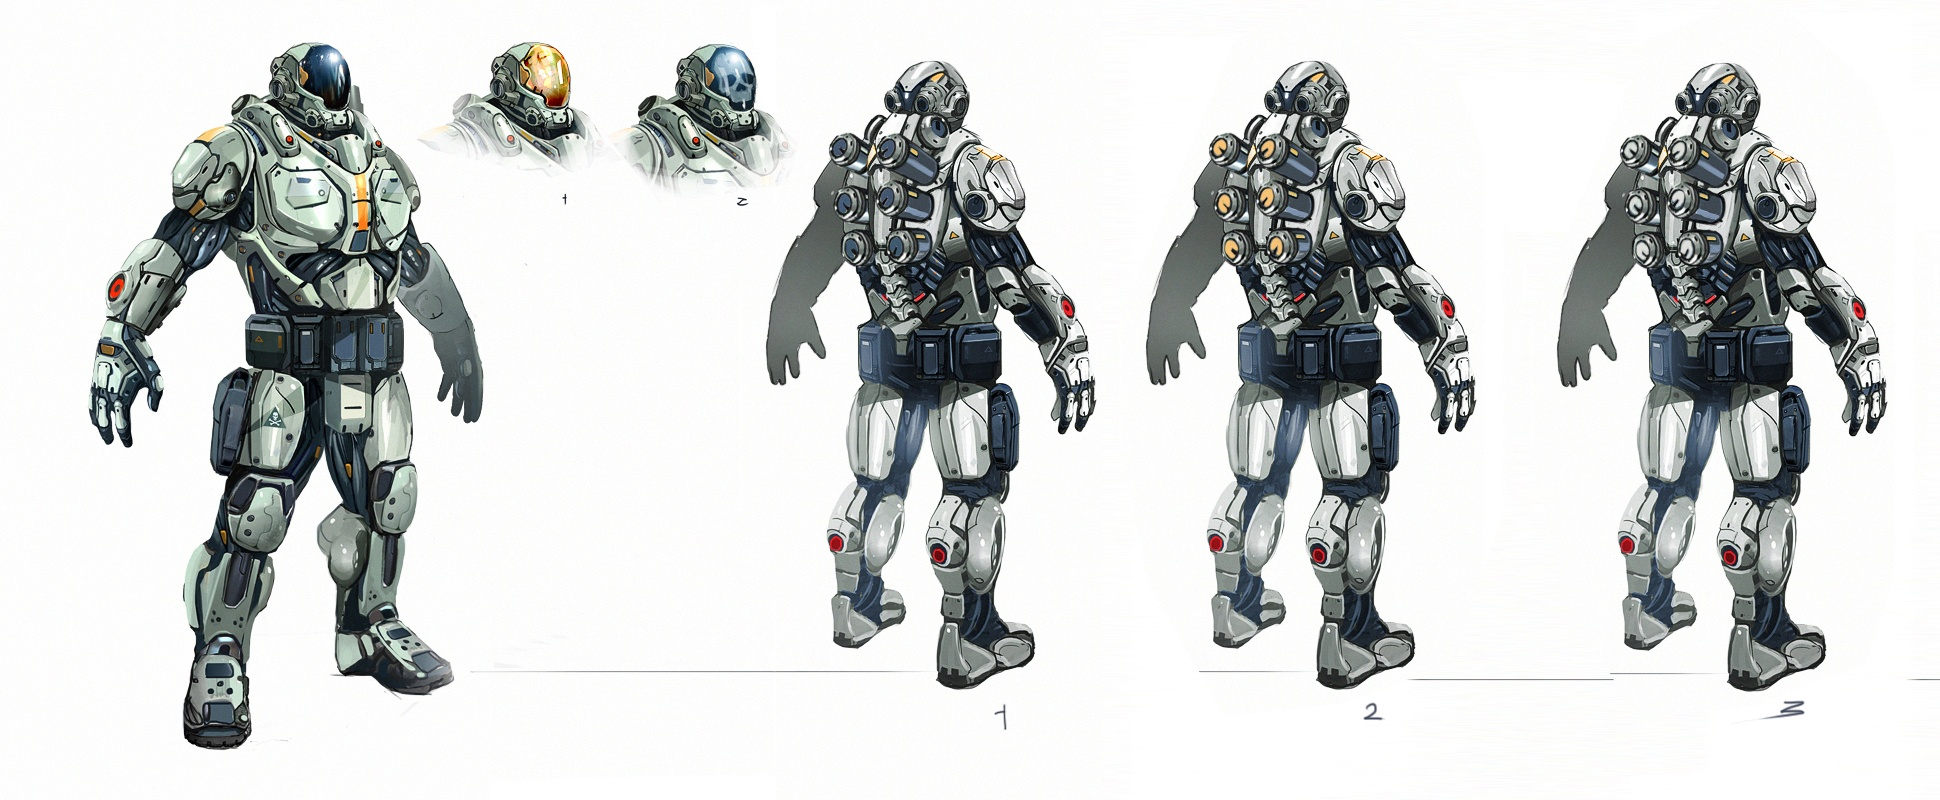 Prometheus Armor Concept Art